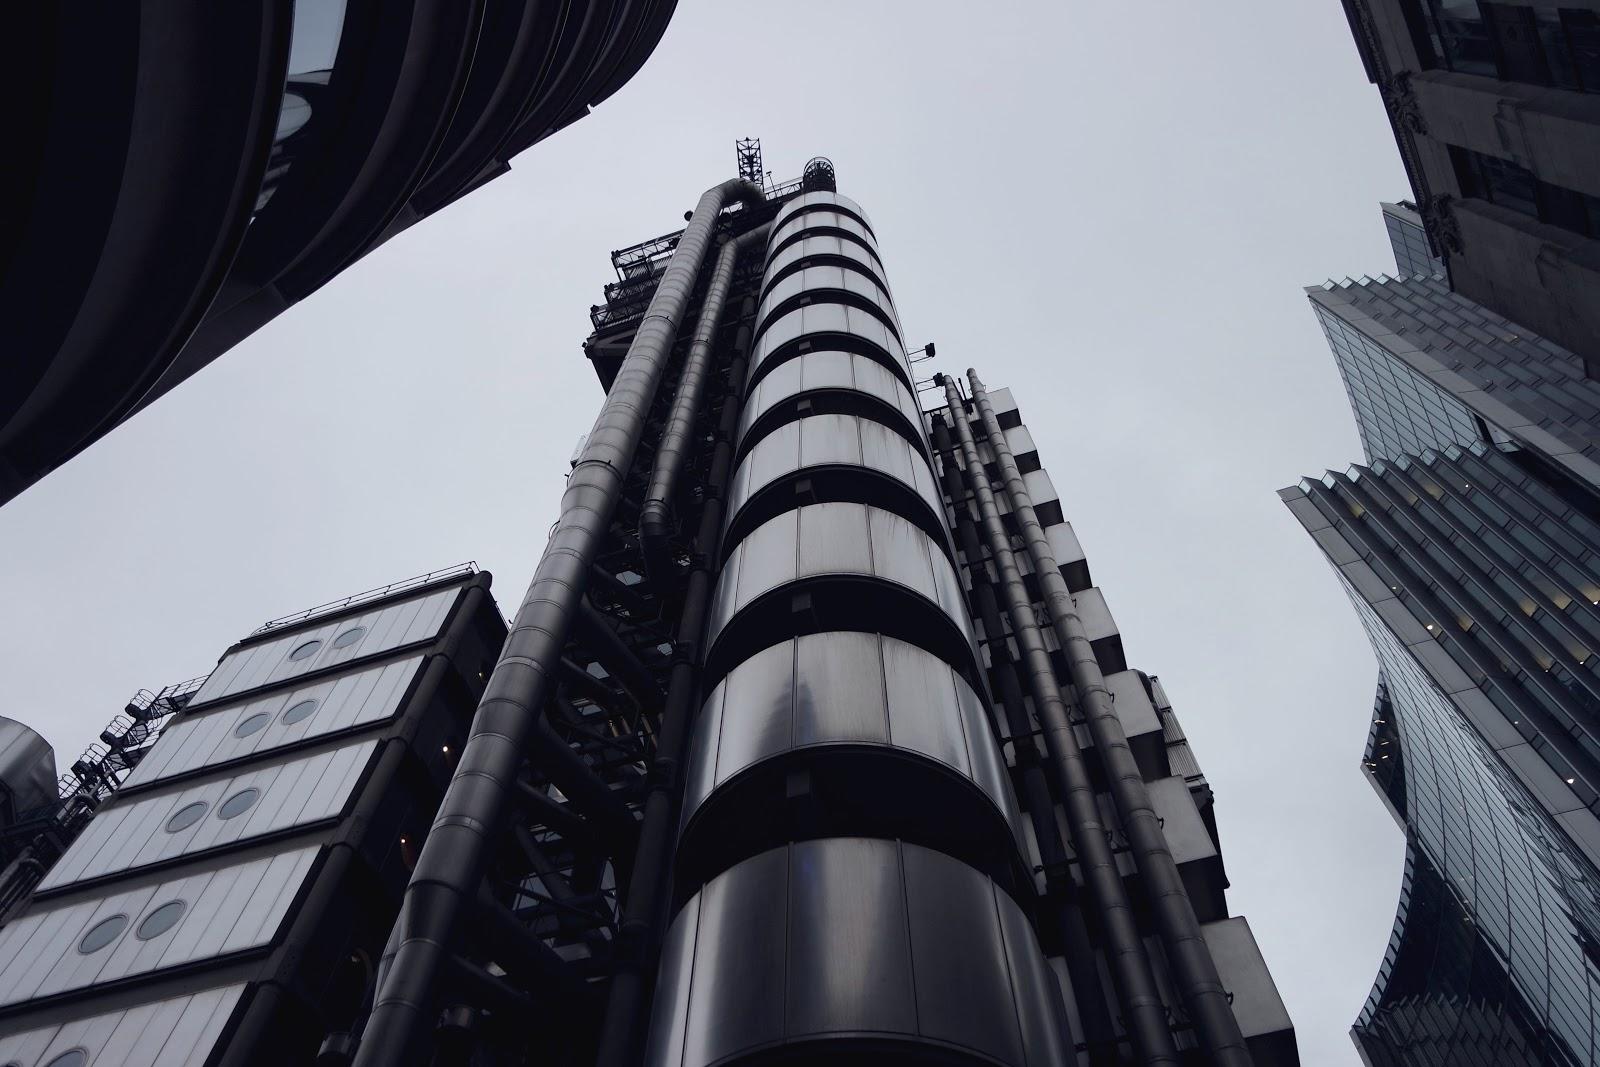 Lioyd's of London, richard rogers, pompidou, London, blog, Londres, South Bank, City of London, London street,